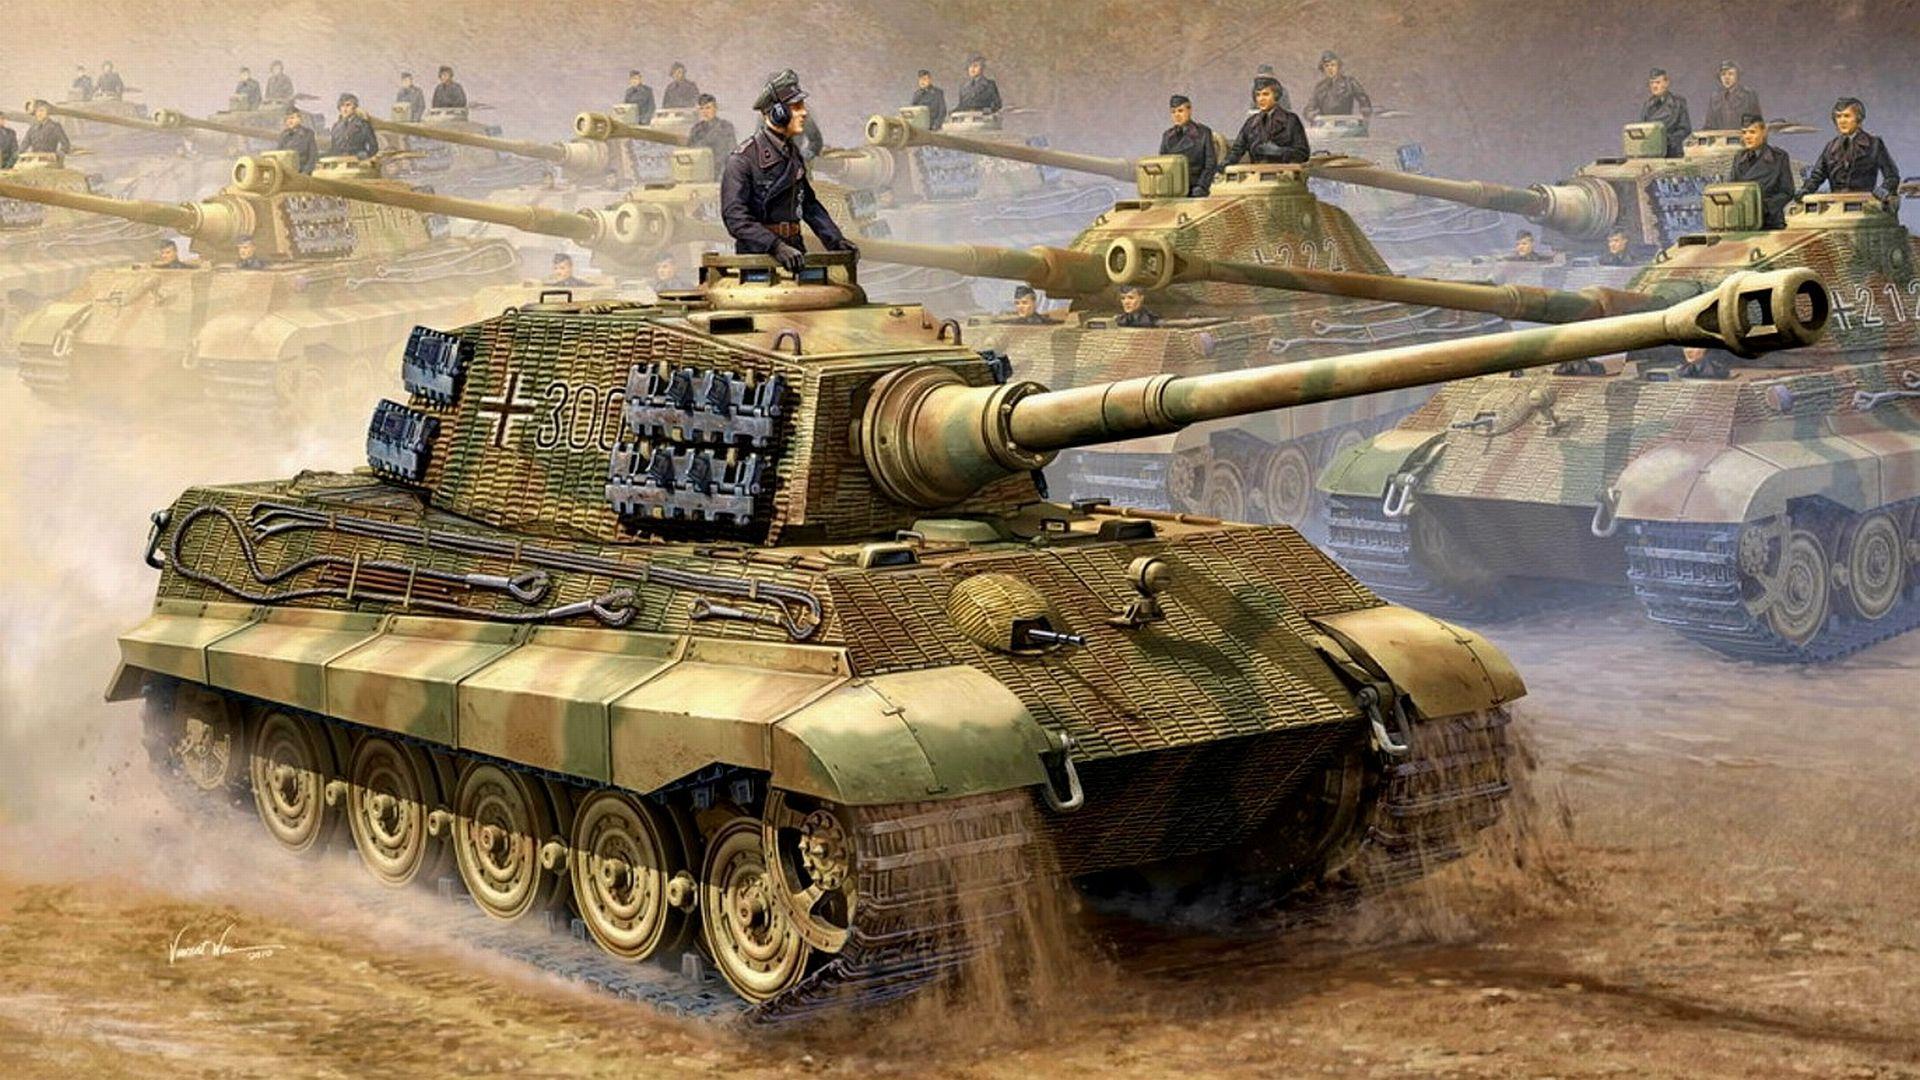 Tiger Tank Wallpapers Wallpaper Cave